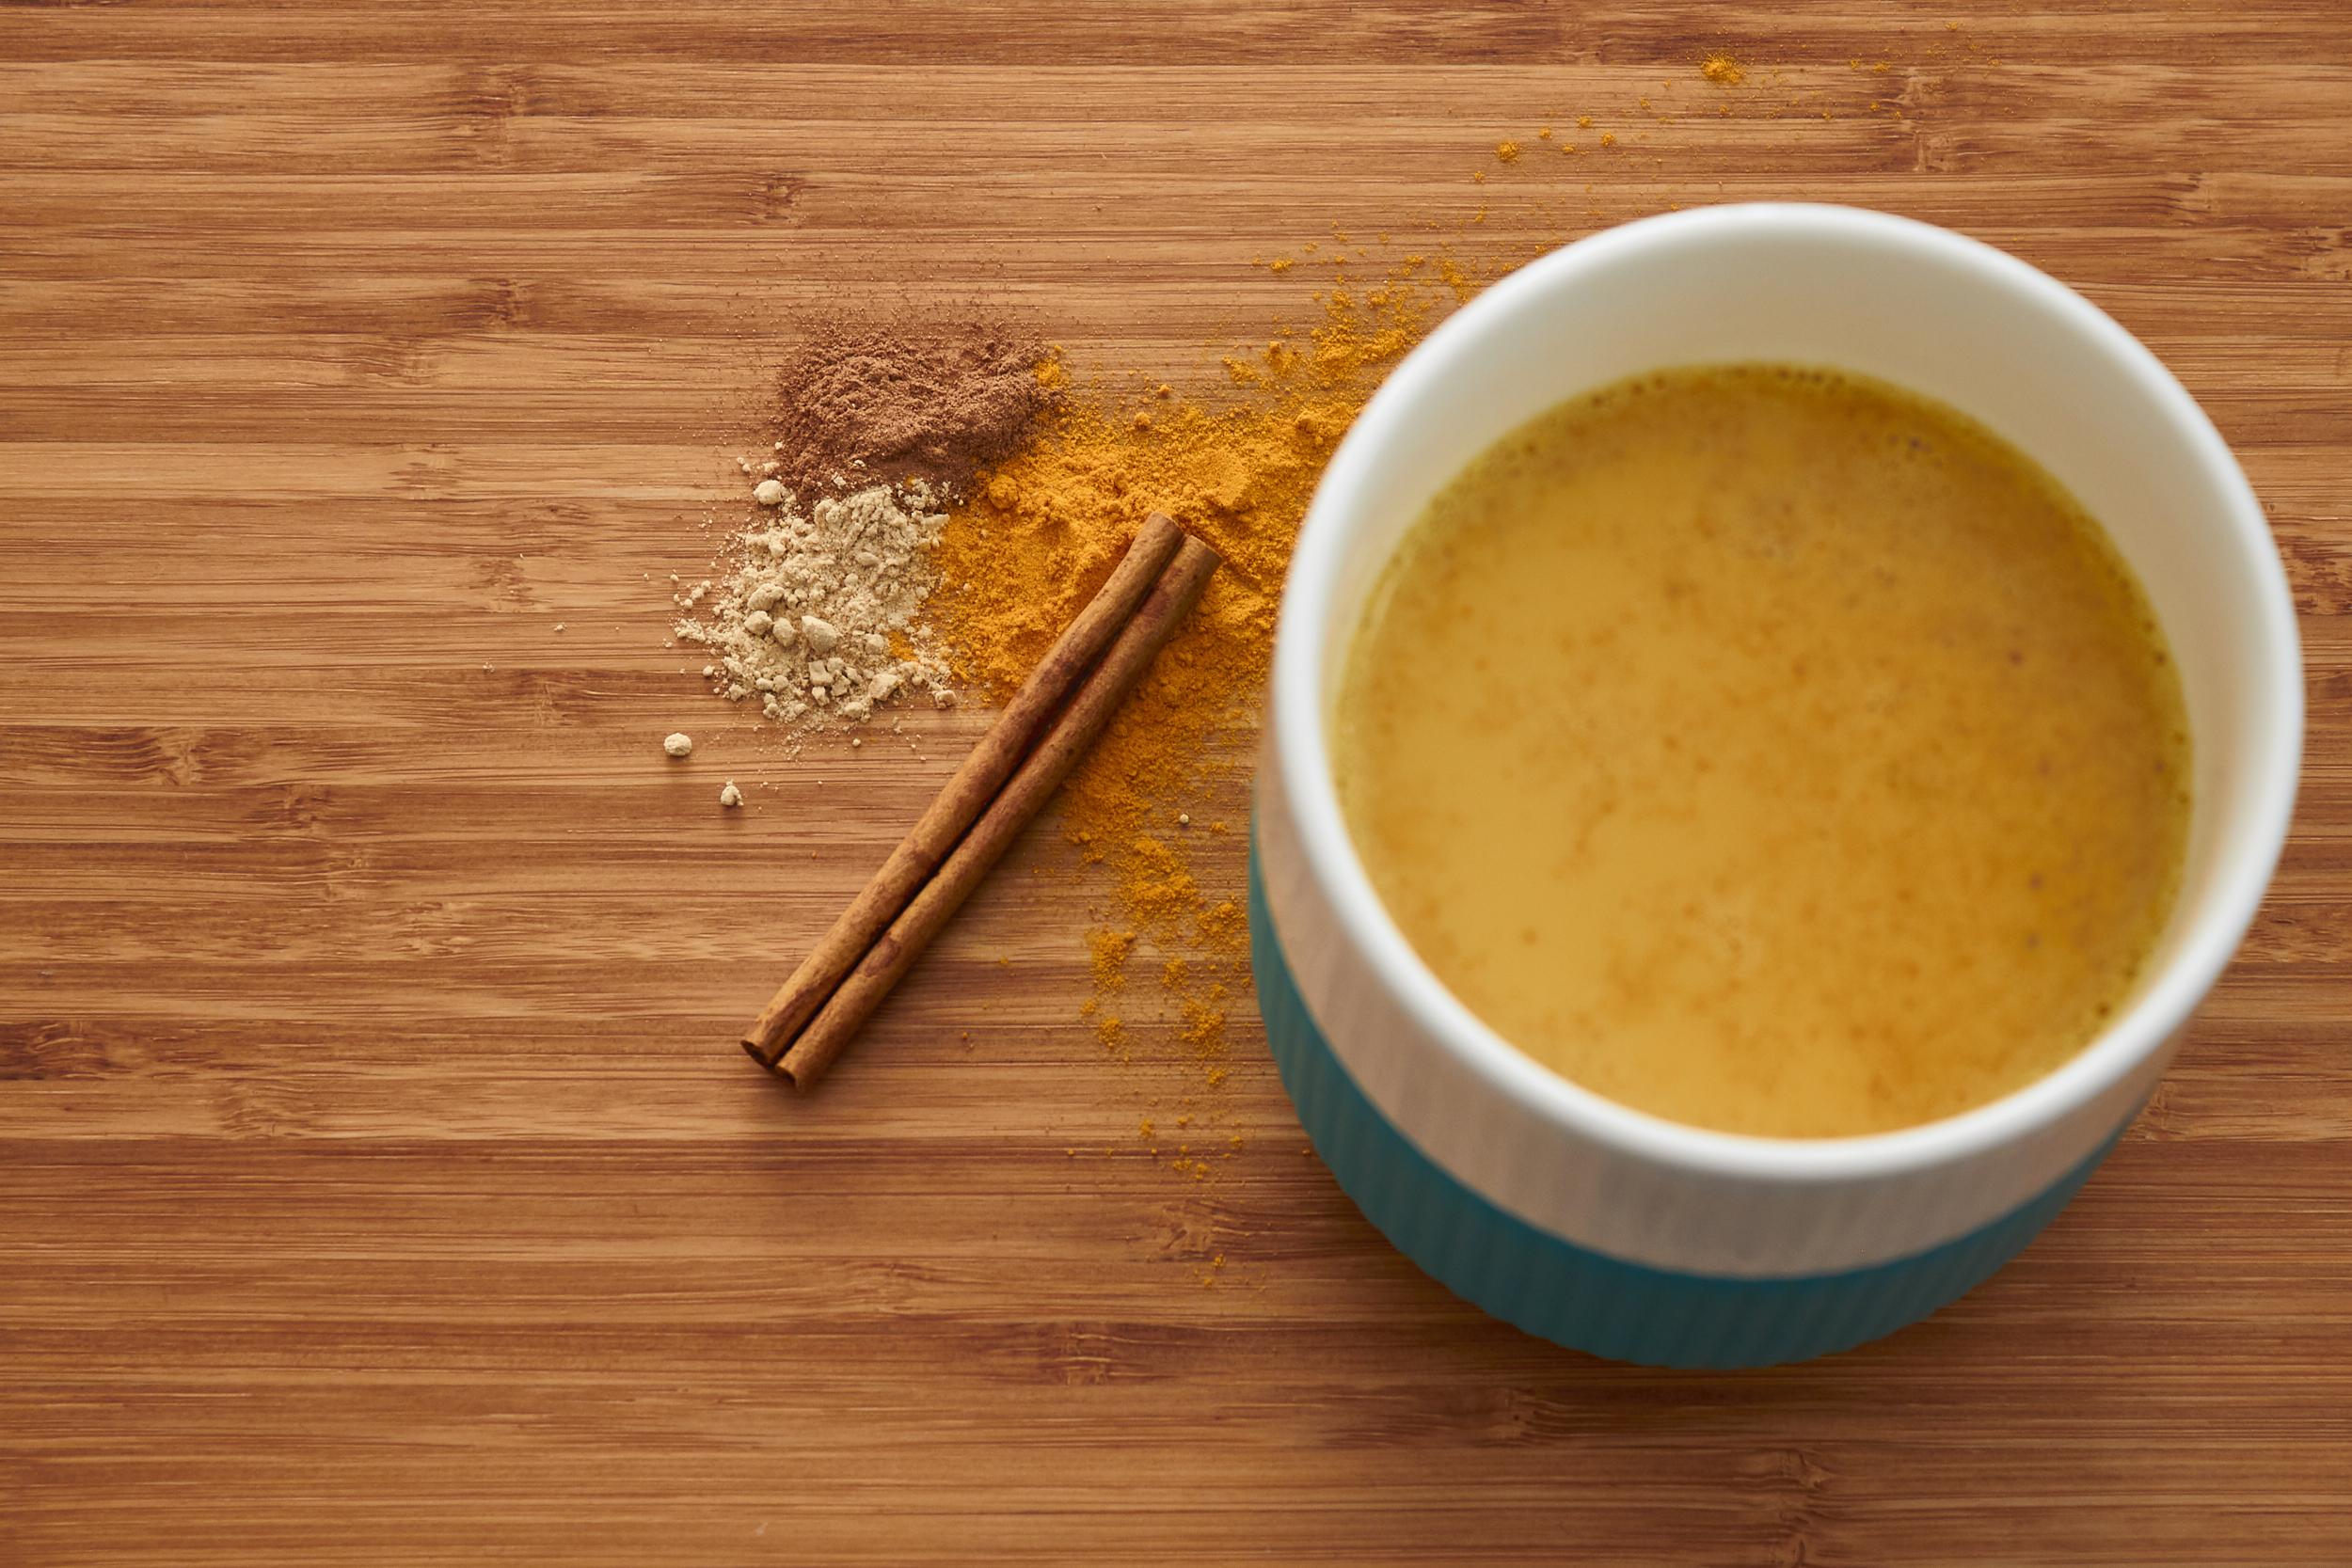 Golden Milk Turmeric Latte (using turmeric powder) | In Carina's Kitchen